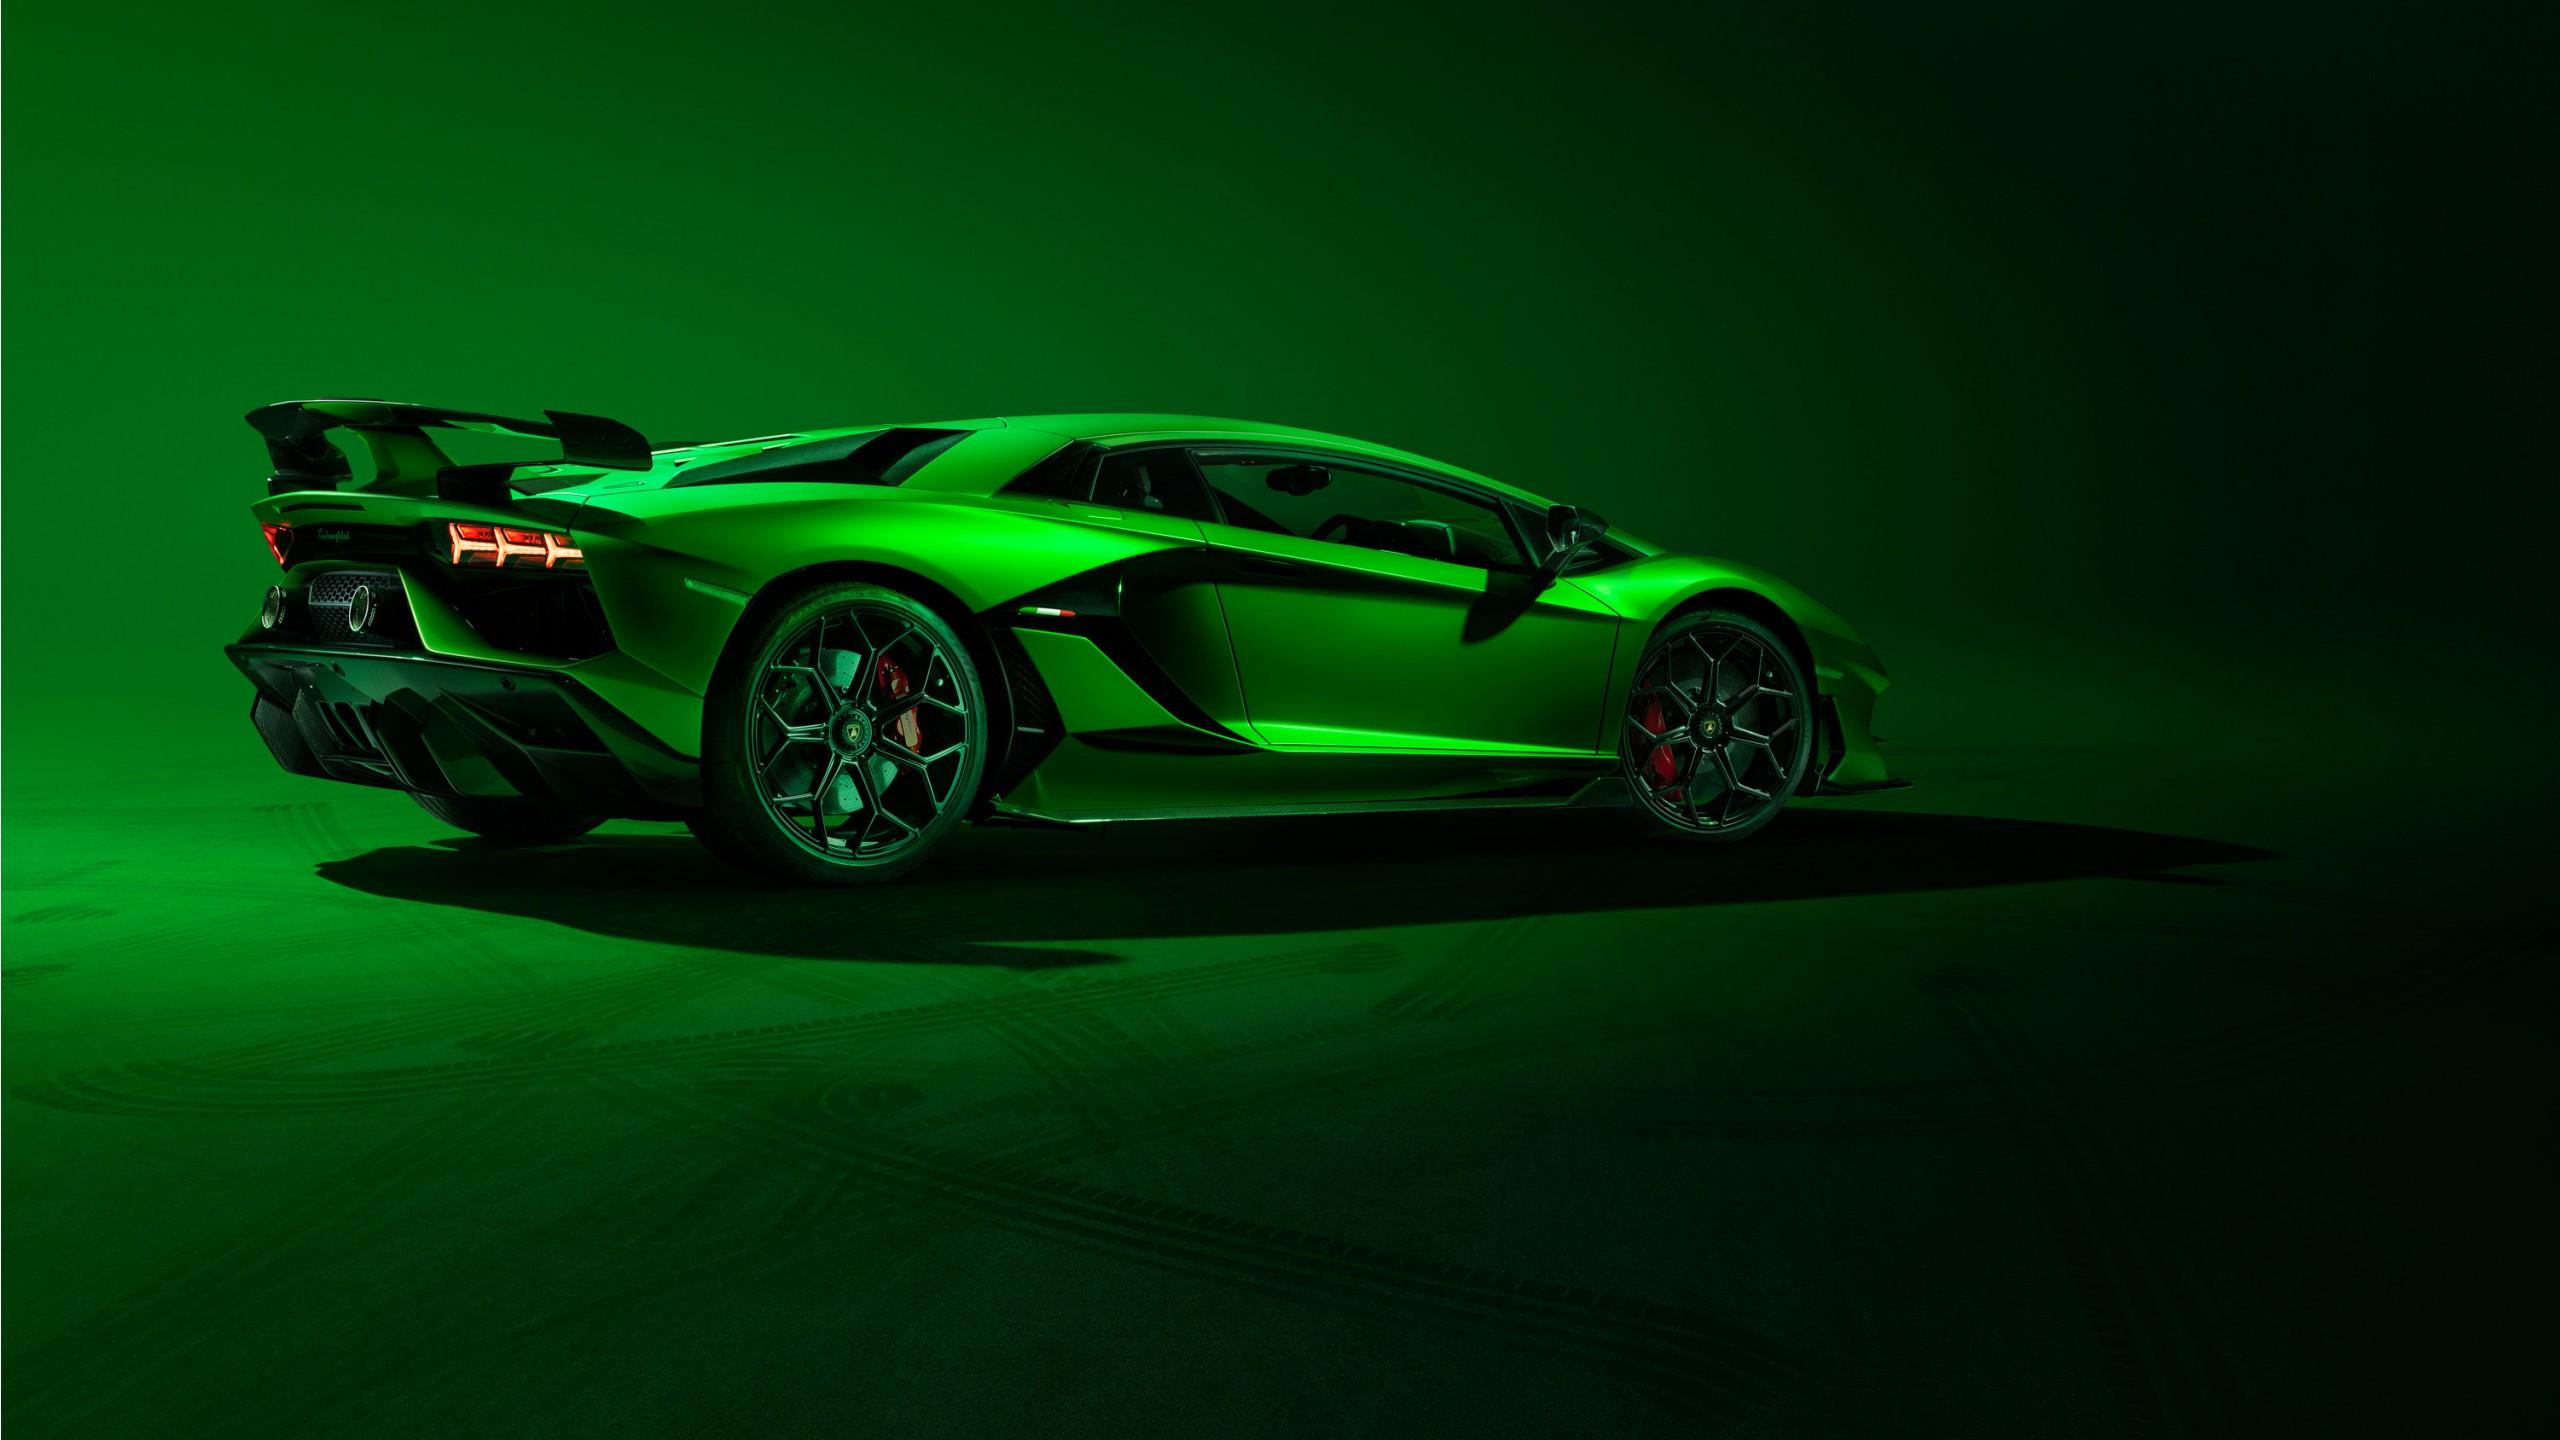 2019 Lamborghini Aventador Svj 3 Wallpaper Hd Car